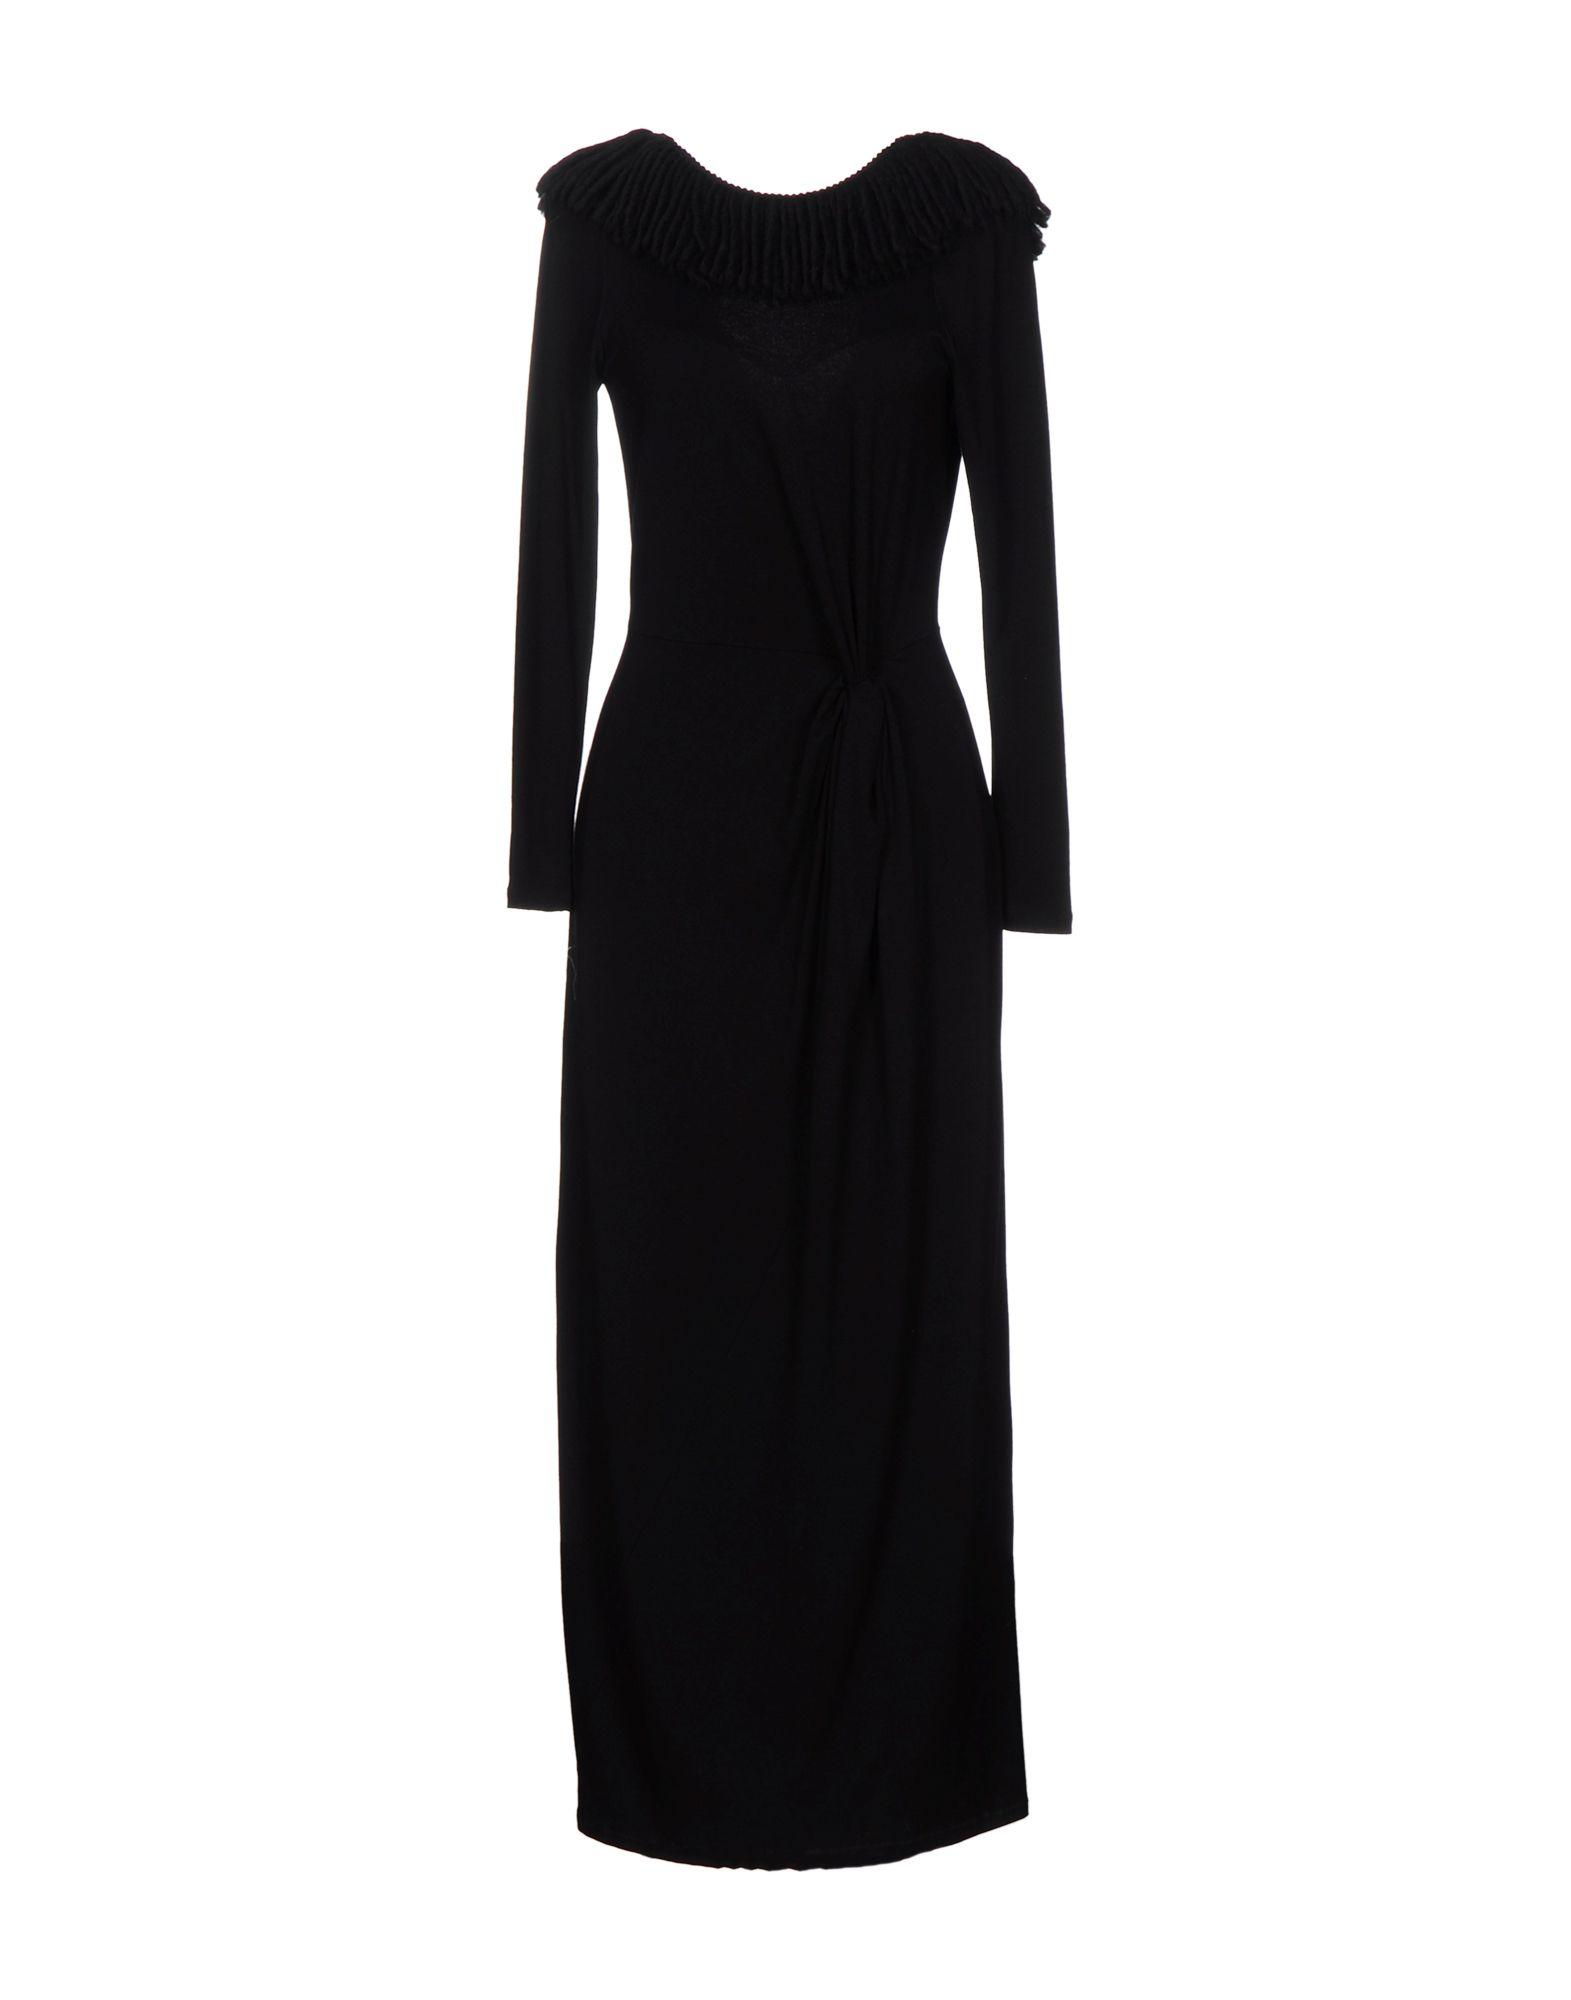 LE RAGAZZE DI ST. BARTH Платье длиной 3/4 le ragazze di st barth короткое платье